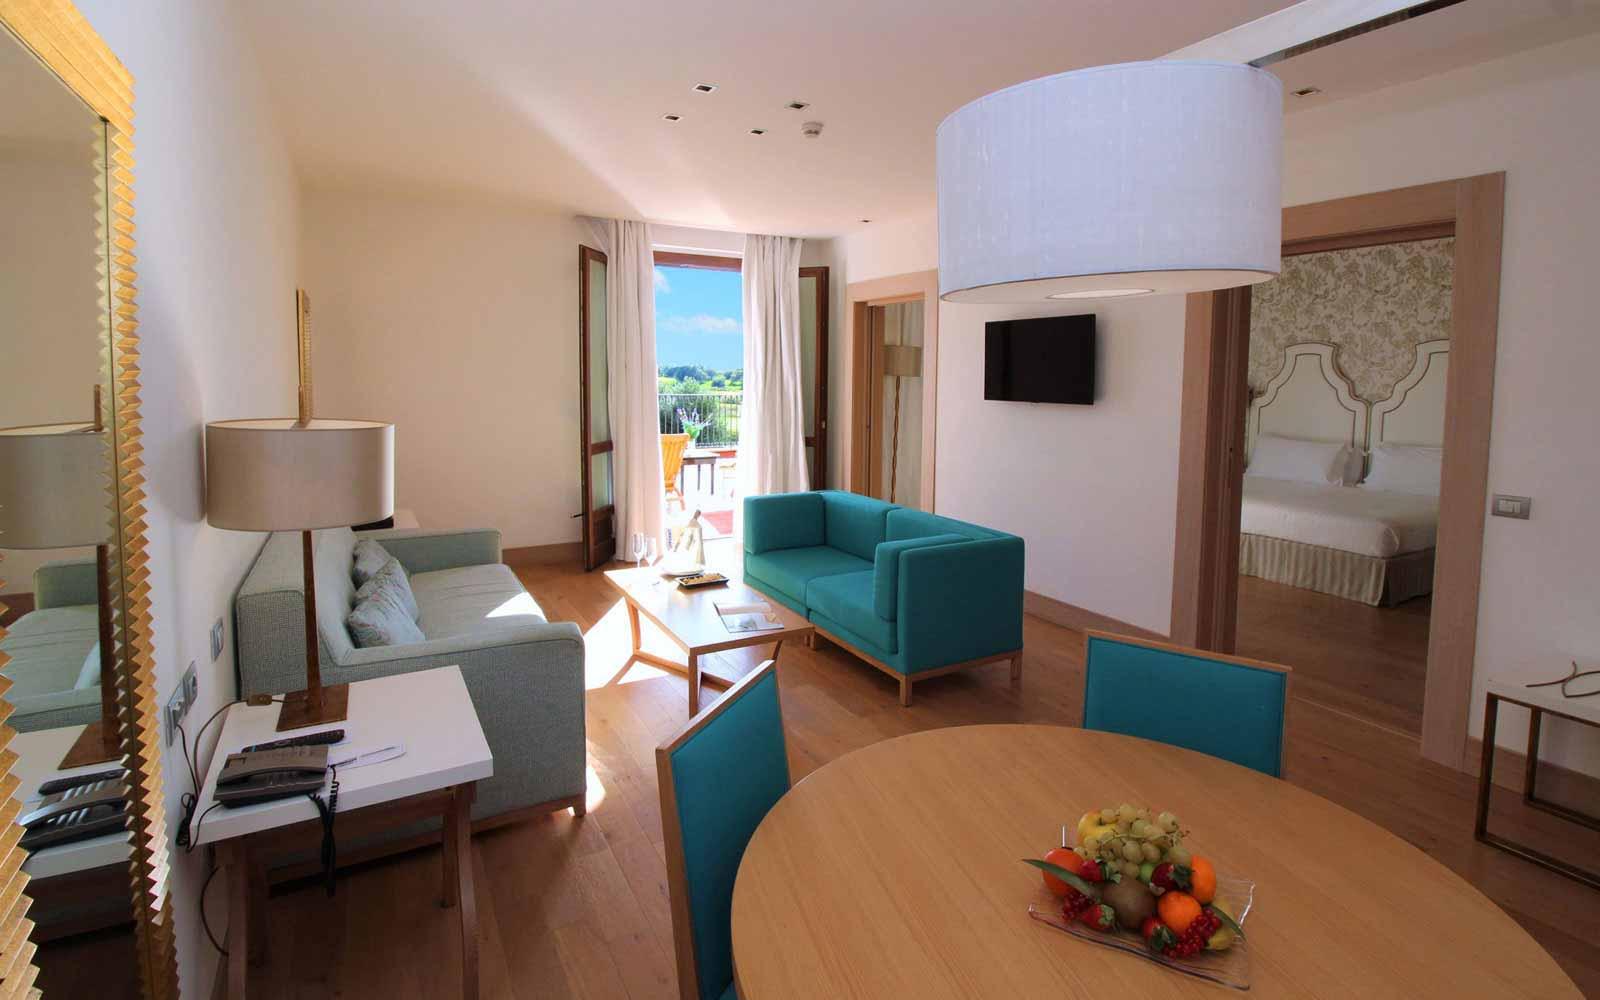 Terrace suite living room at Donnafugata Golf Resort & Spa